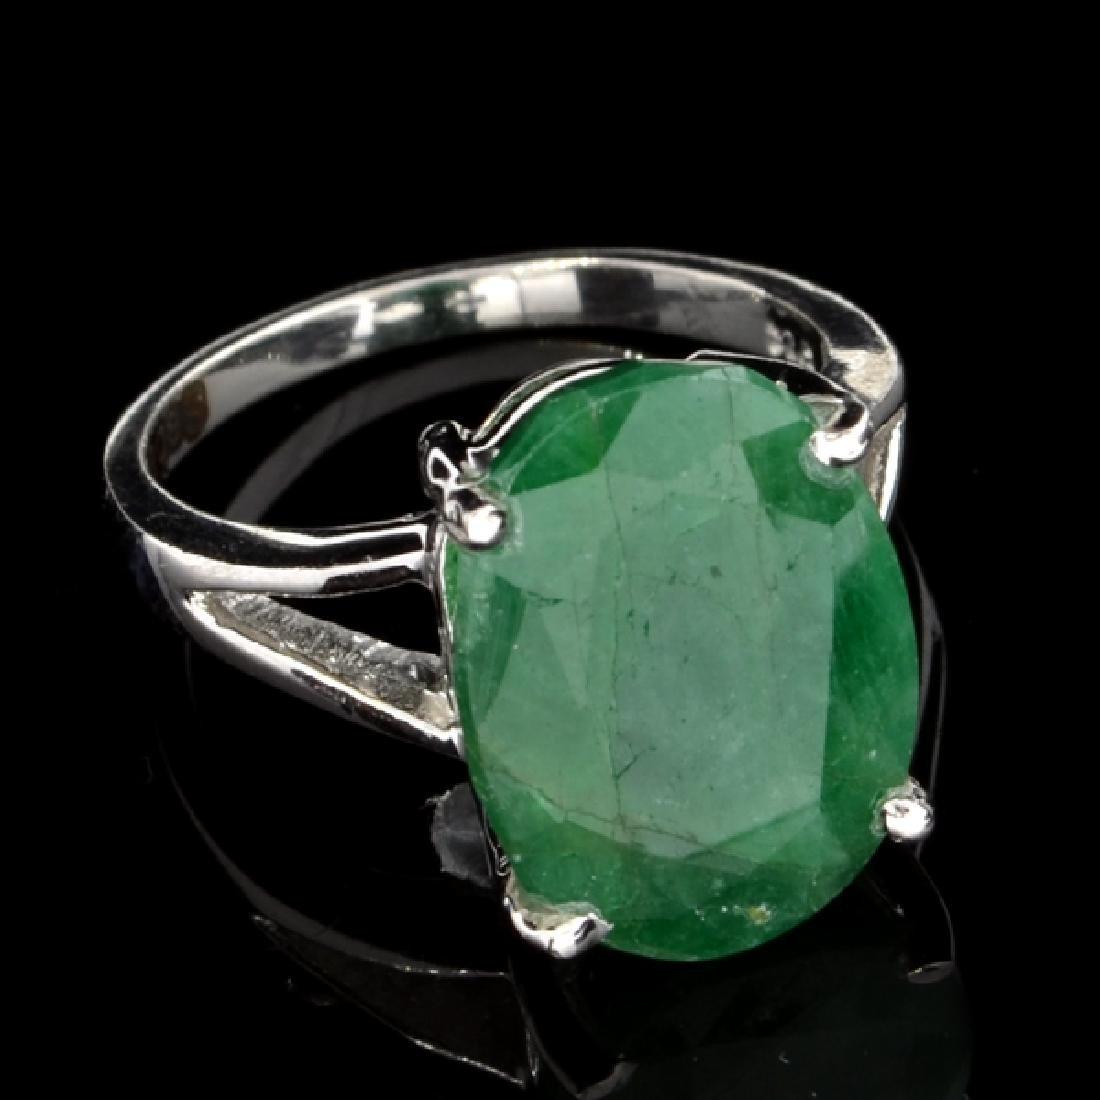 Fine Jewelry Designer Sebastian 9.10CT Oval Cut Green